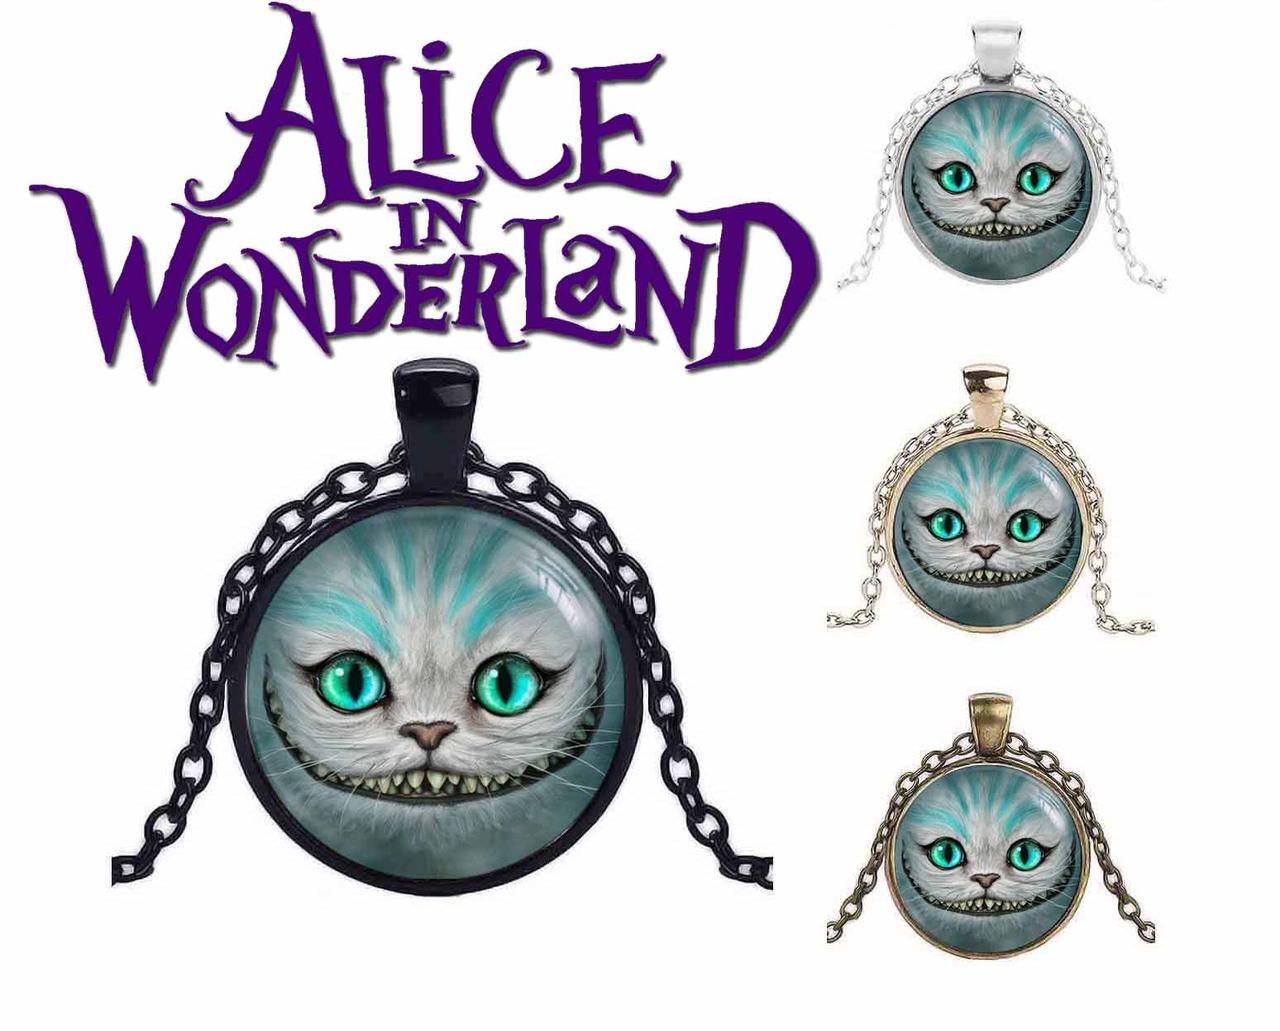 Кулон Чеширский кот Алиса в стране чудес / Alice in Wonderland